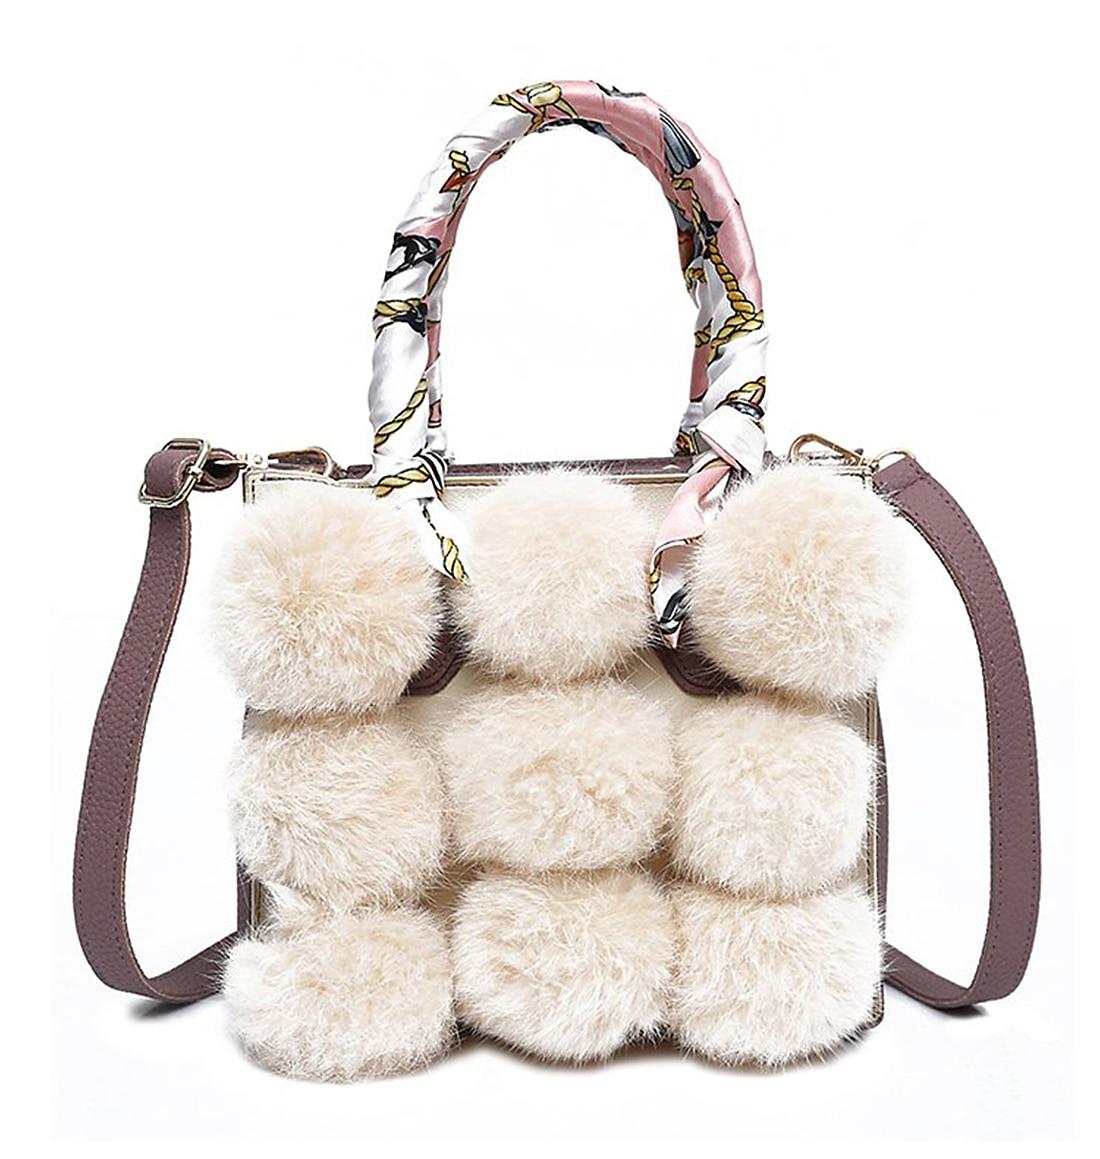 Winter Plush Fur PU Leather Colorfull Ribbon Top Handle Bag For Women New Fashion Ladies Handbag Shoulder Bags<br>